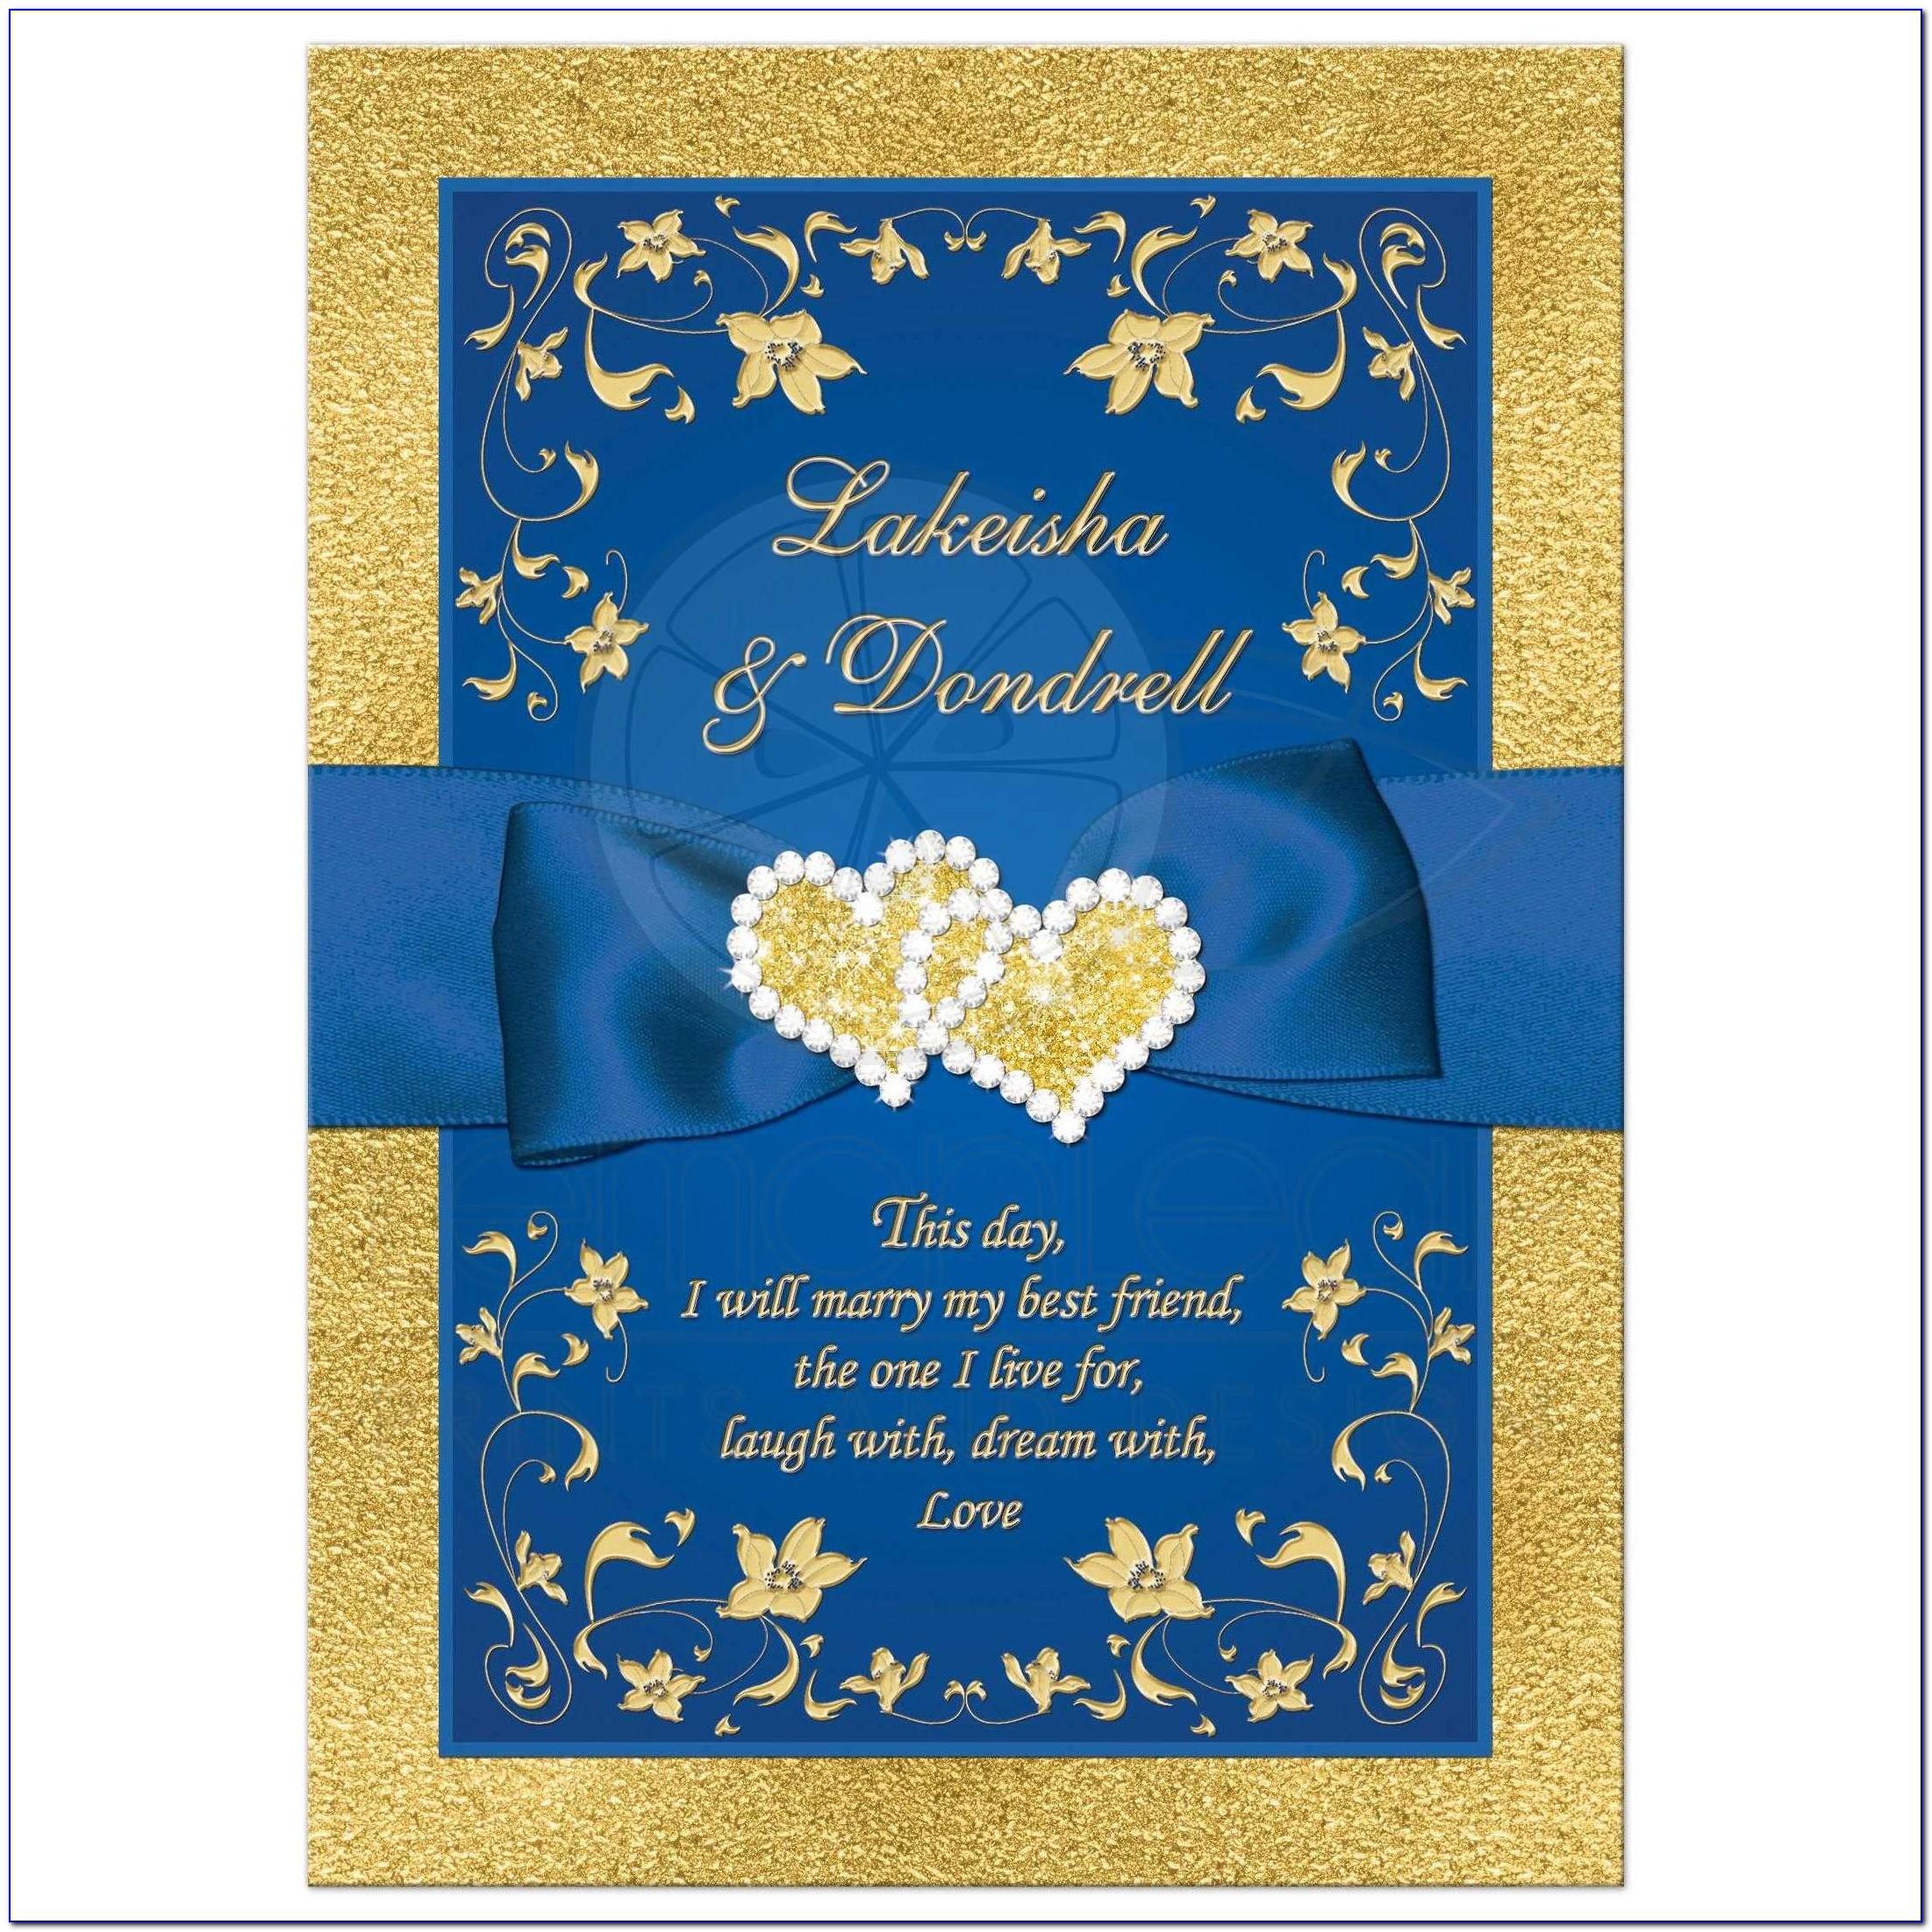 Sample Invitation Card For Golden Wedding Anniversary